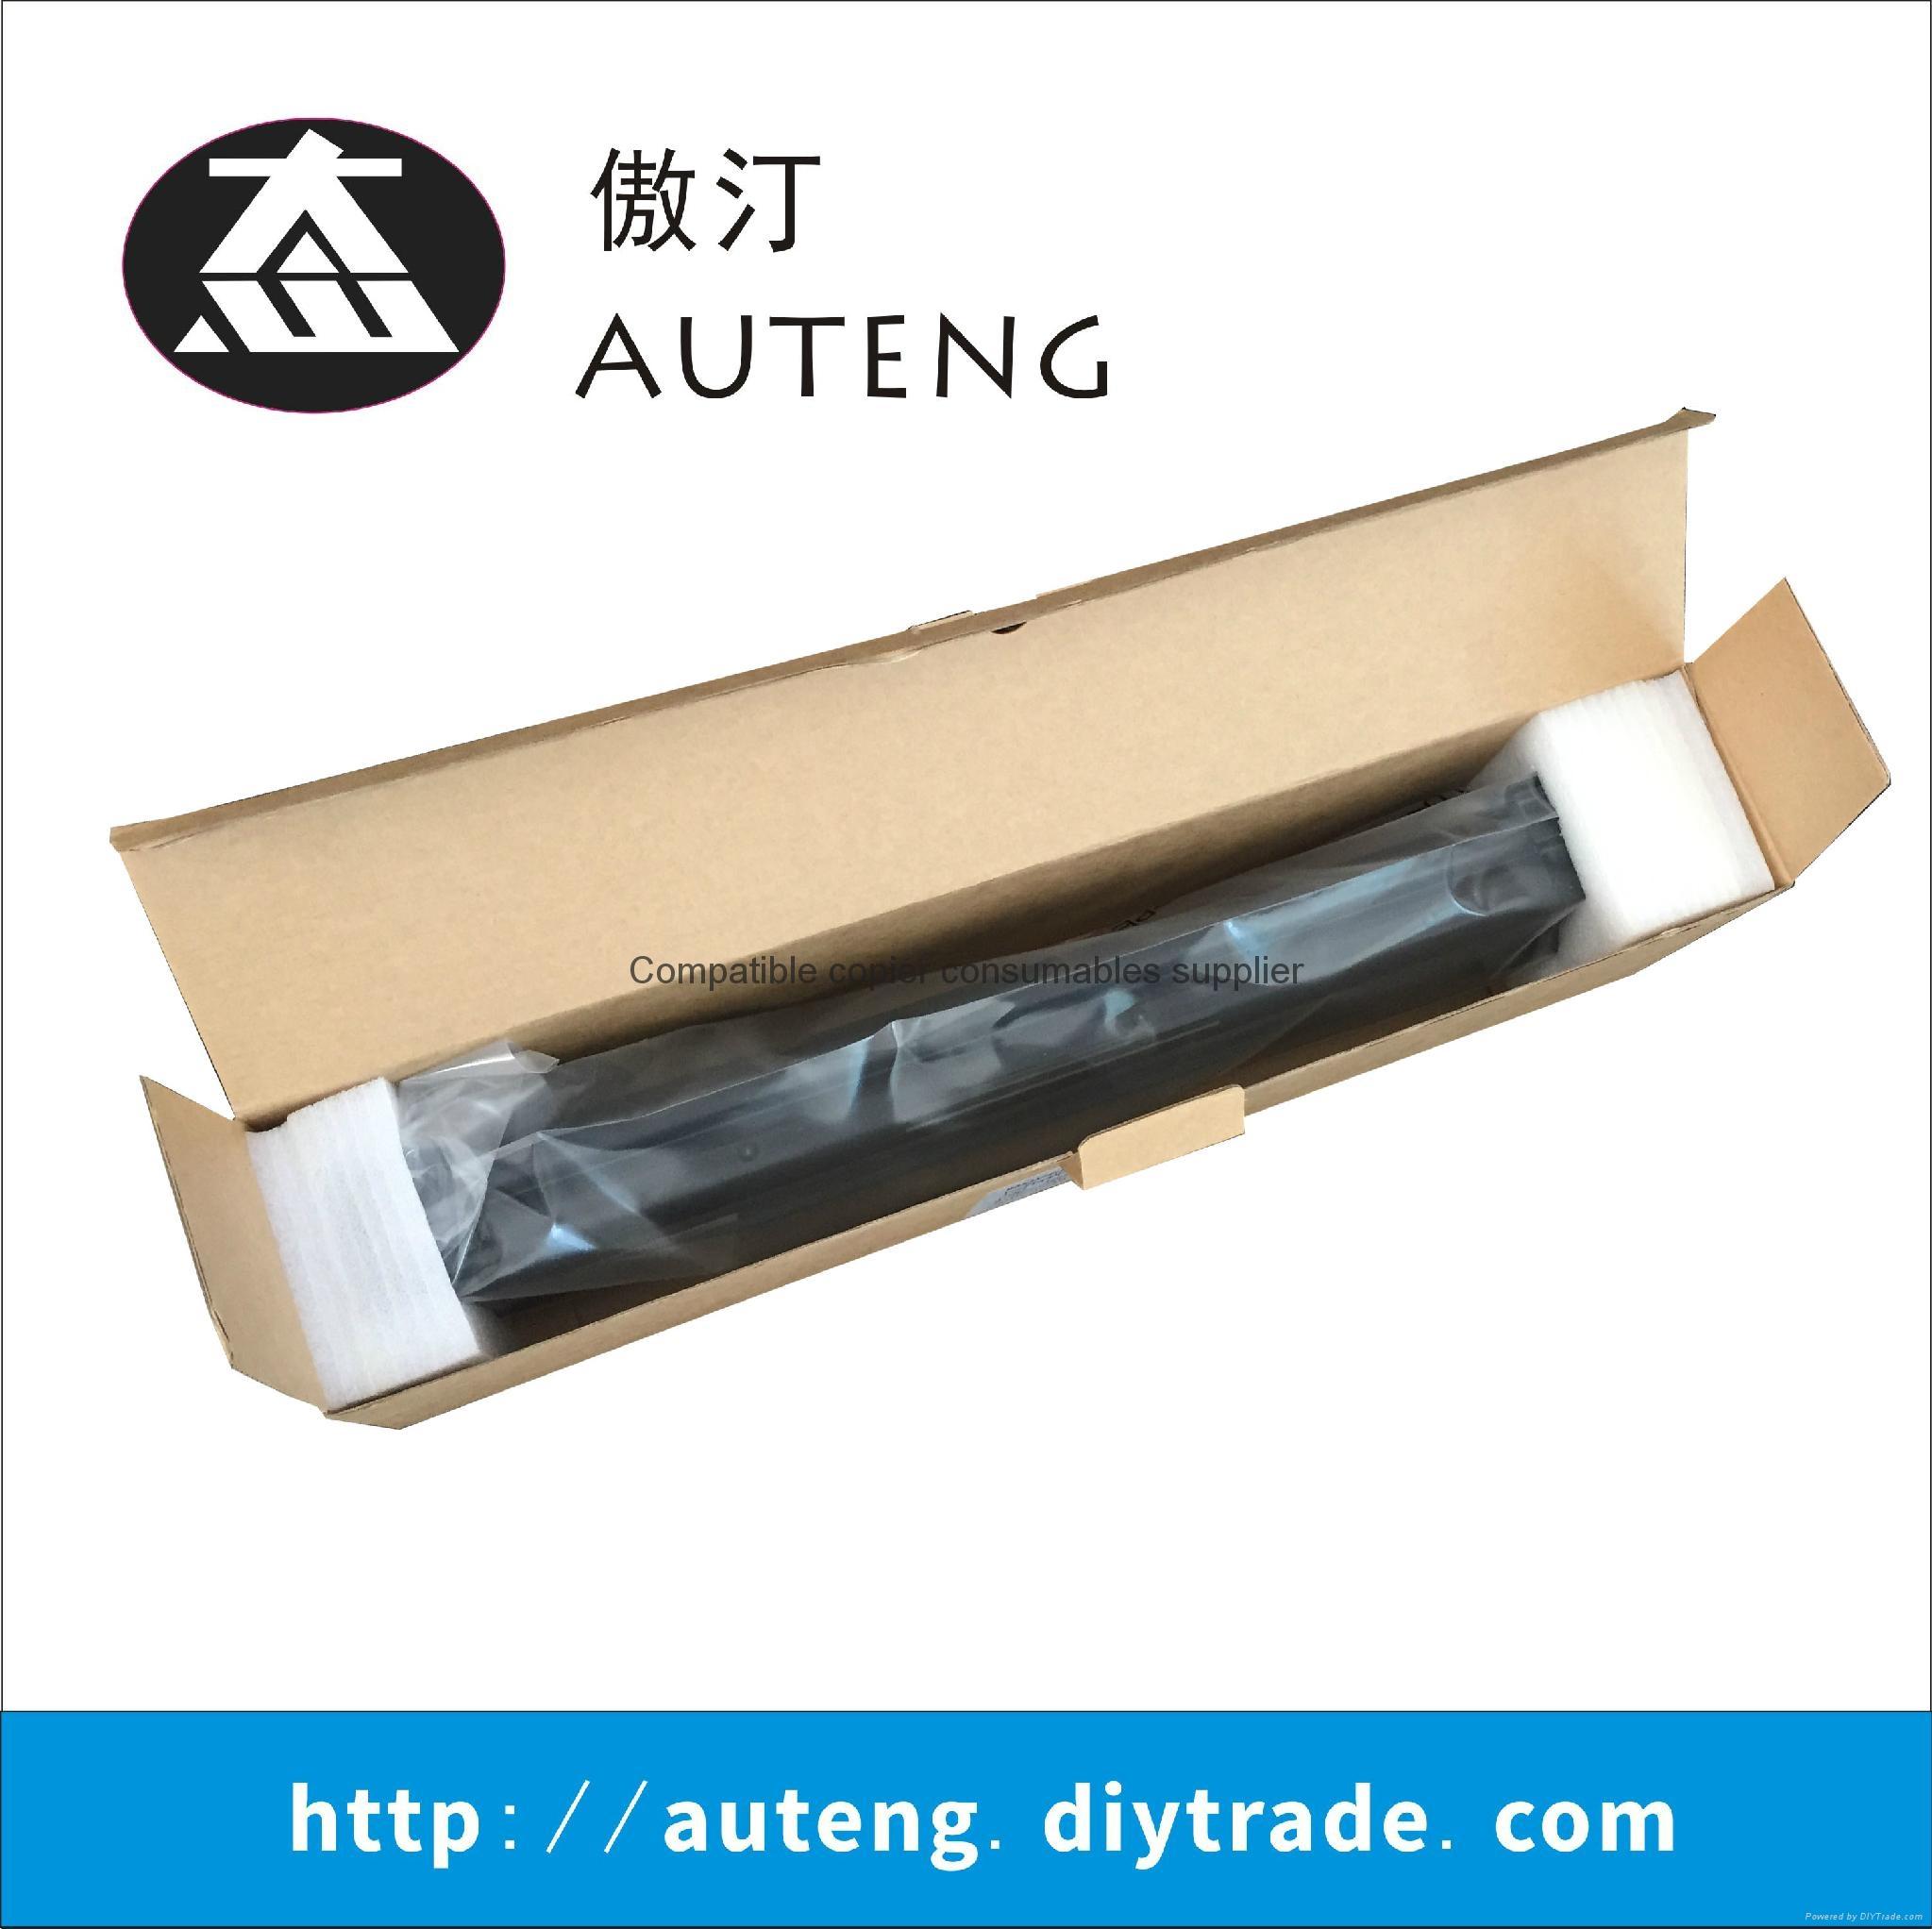 柯美BIZHUB C200 C253 C353兼容彩粉 黃色碳粉盒 TN214Y/TN213Y/TN314Y 3